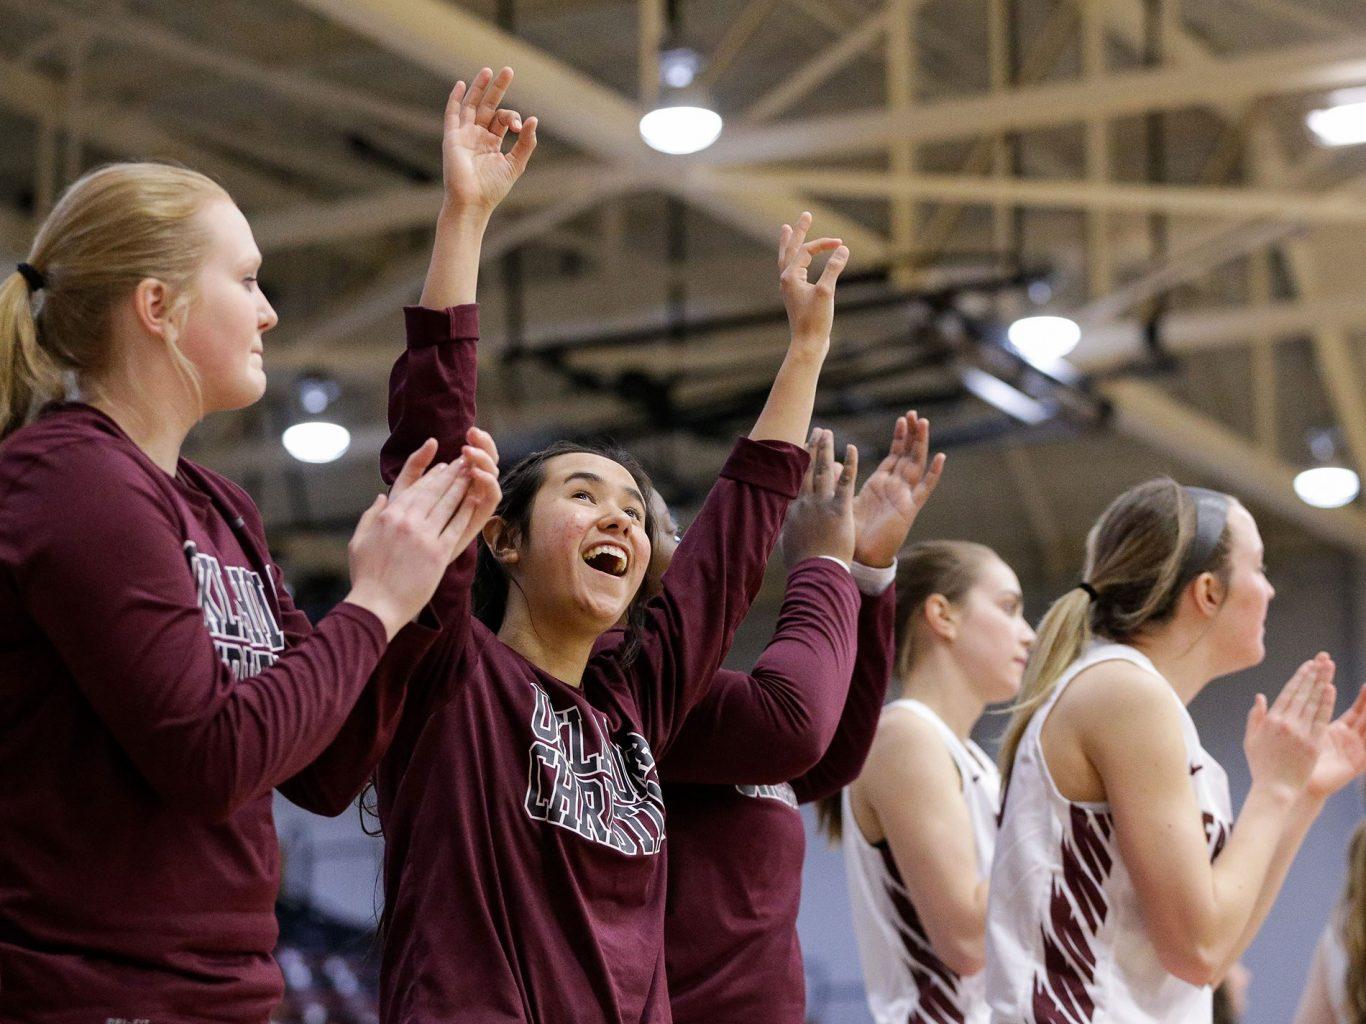 OC womens basketball team cheering